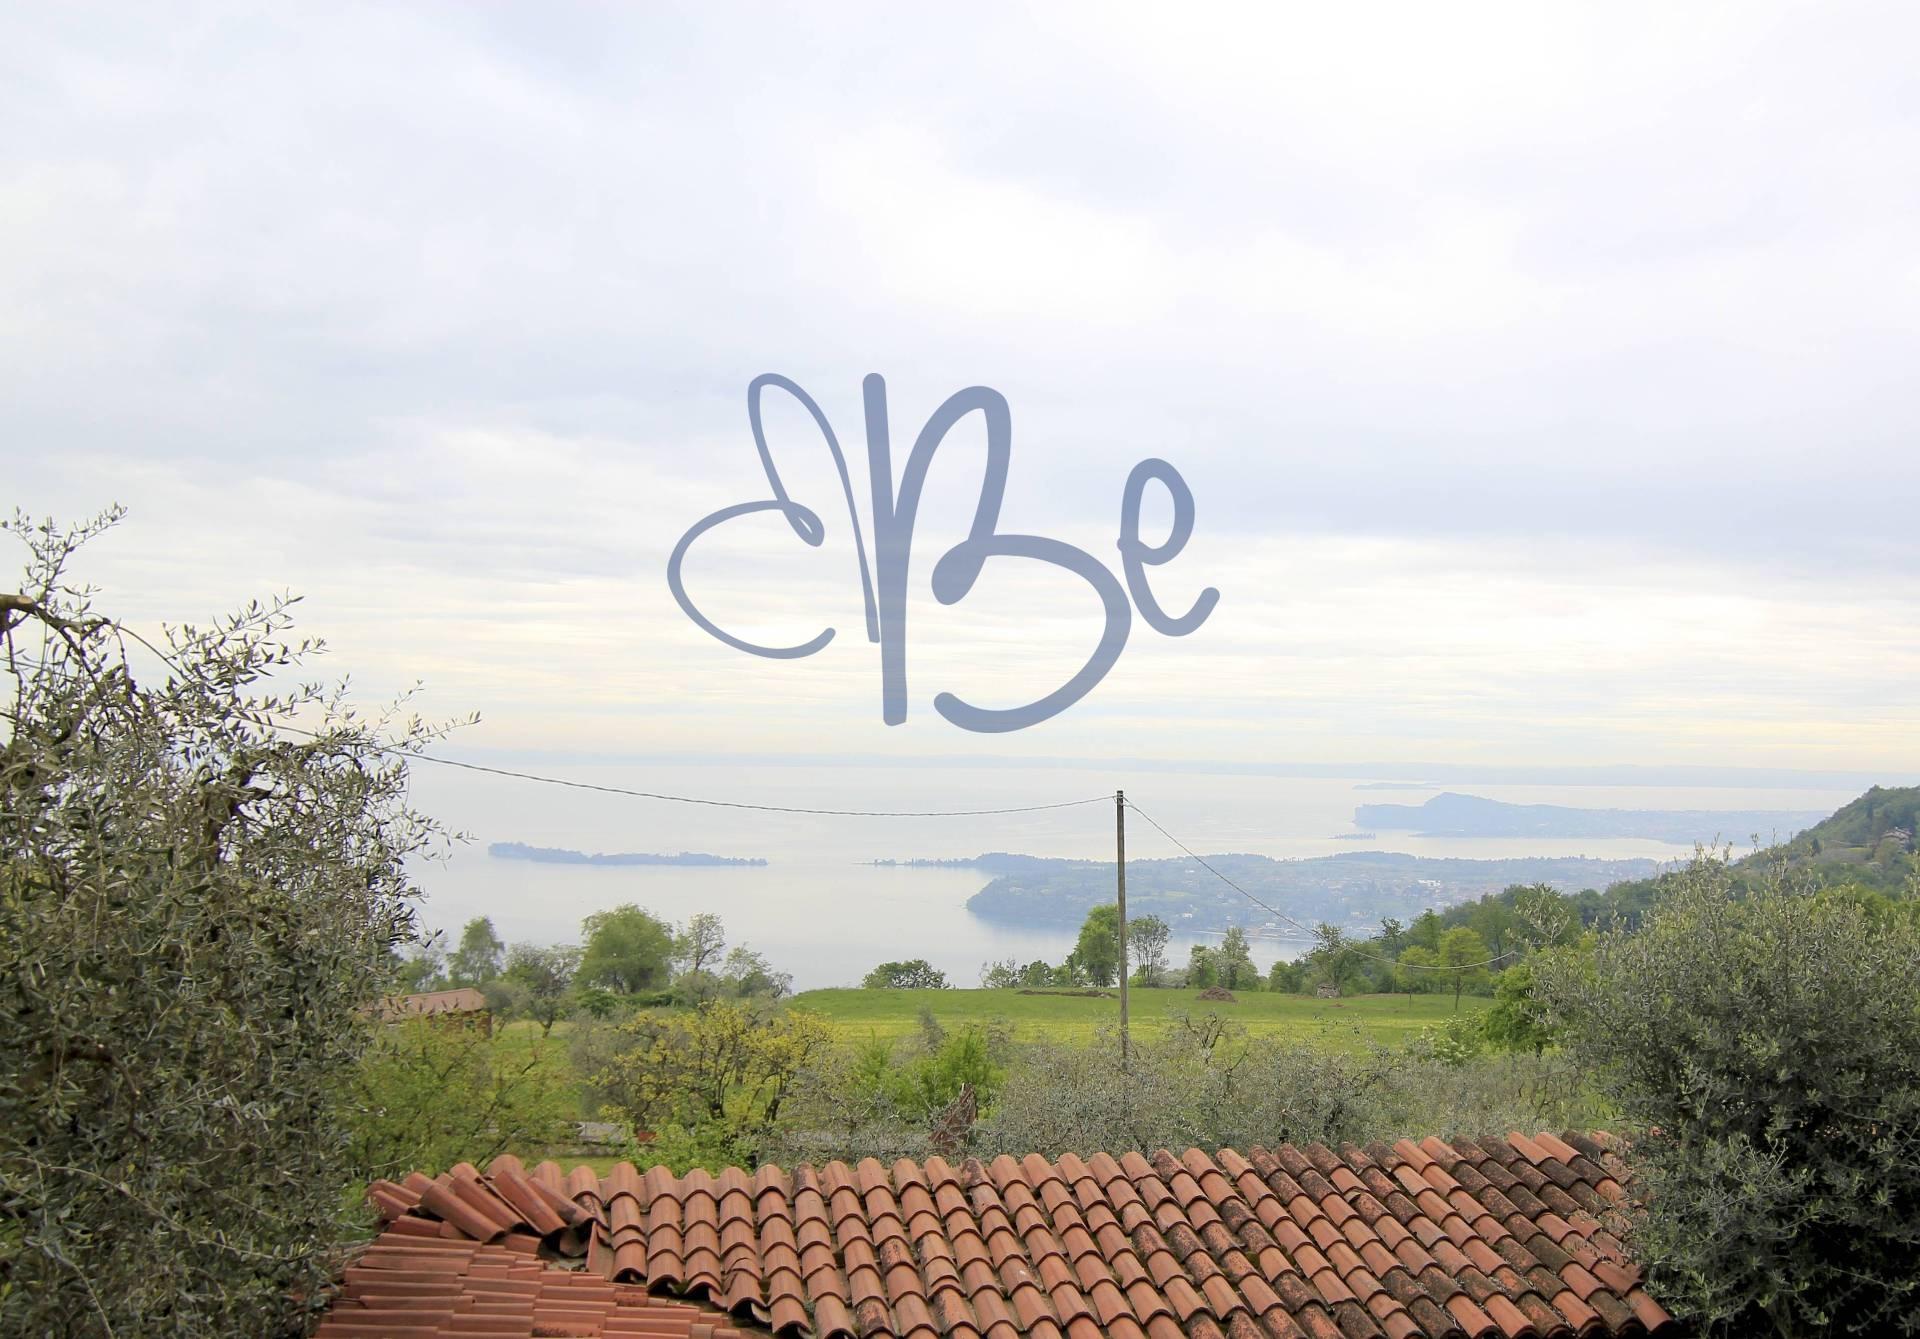 Appartamento in affitto a Salò, 3 locali, zona Località: Salò, Trattative riservate | CambioCasa.it